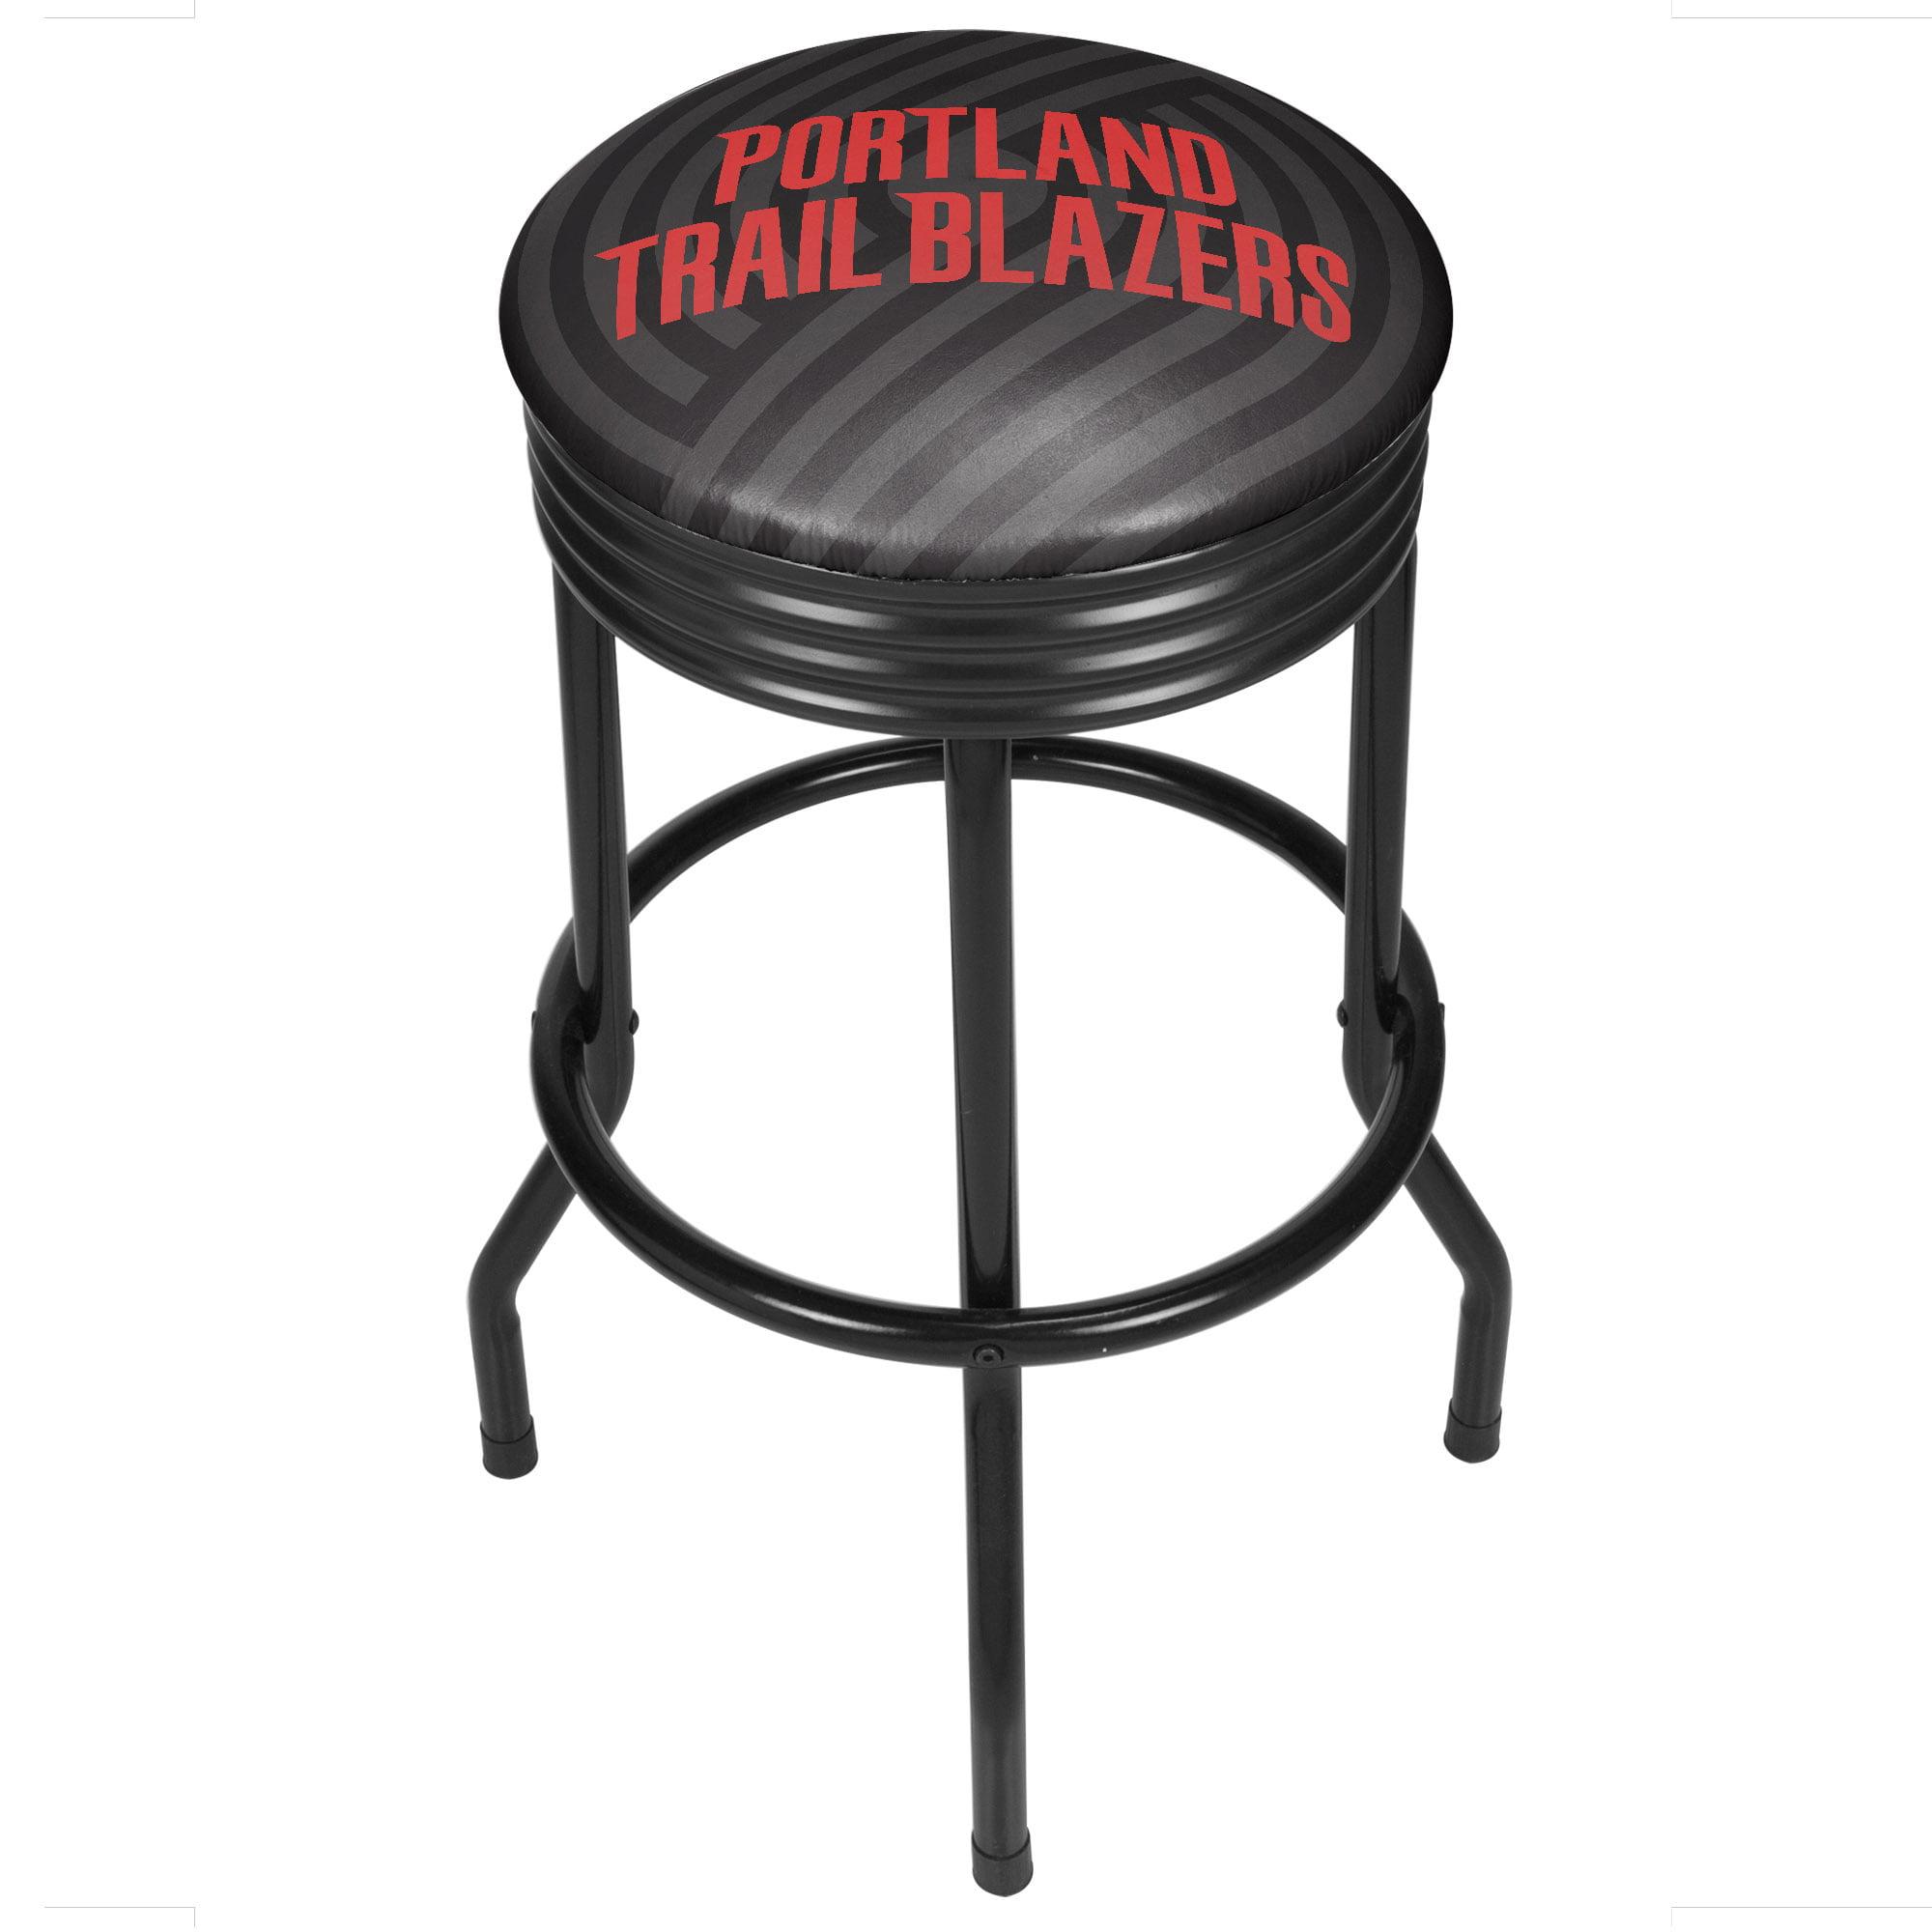 NBA Black Ribbed Bar Stool - Fade - Portland Trailblazers